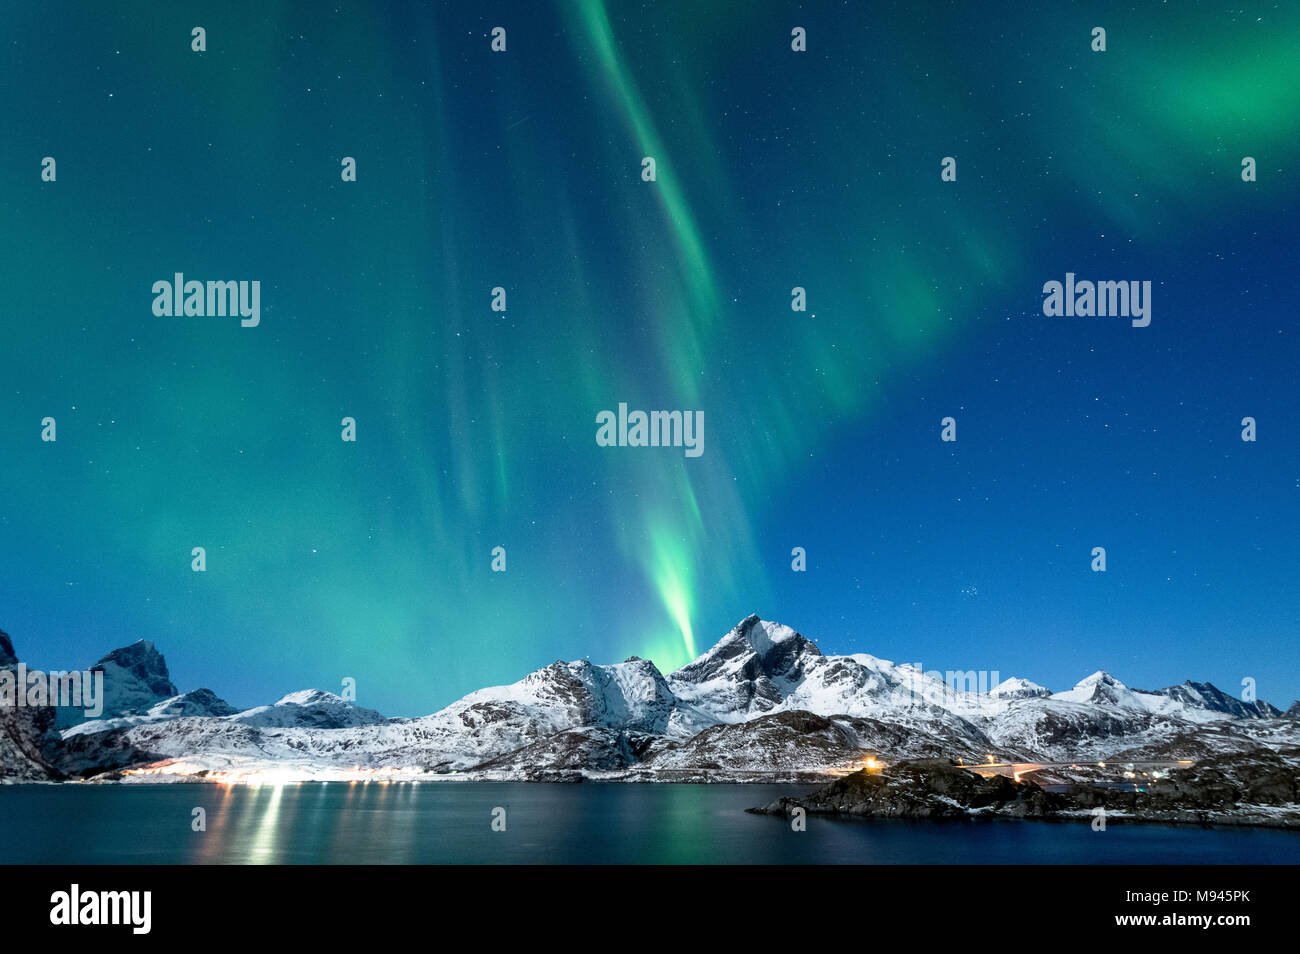 Northern Lights in Lofoten, Norway - Stock Image